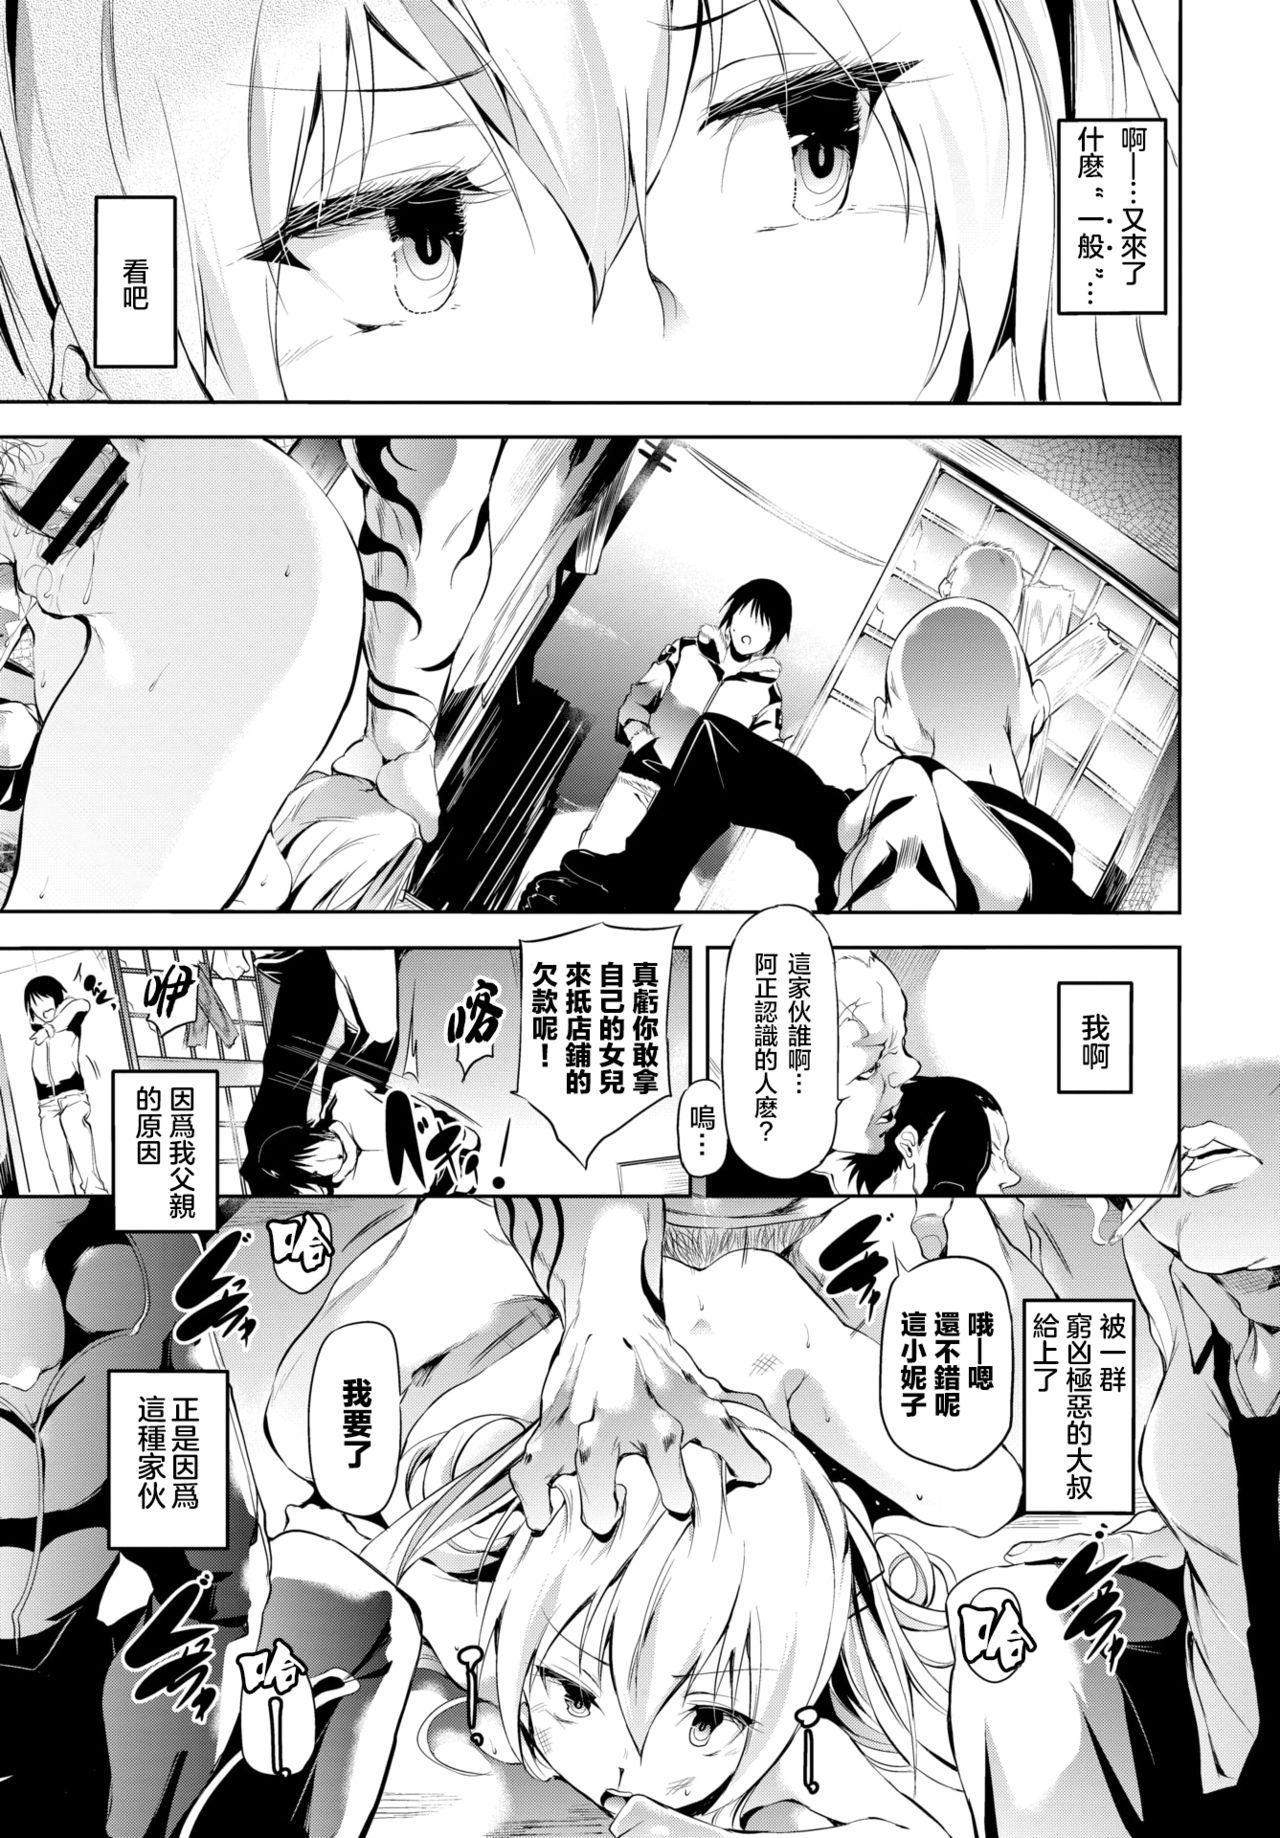 Abaraya no Onnanoko   破落家庭的女孩 11